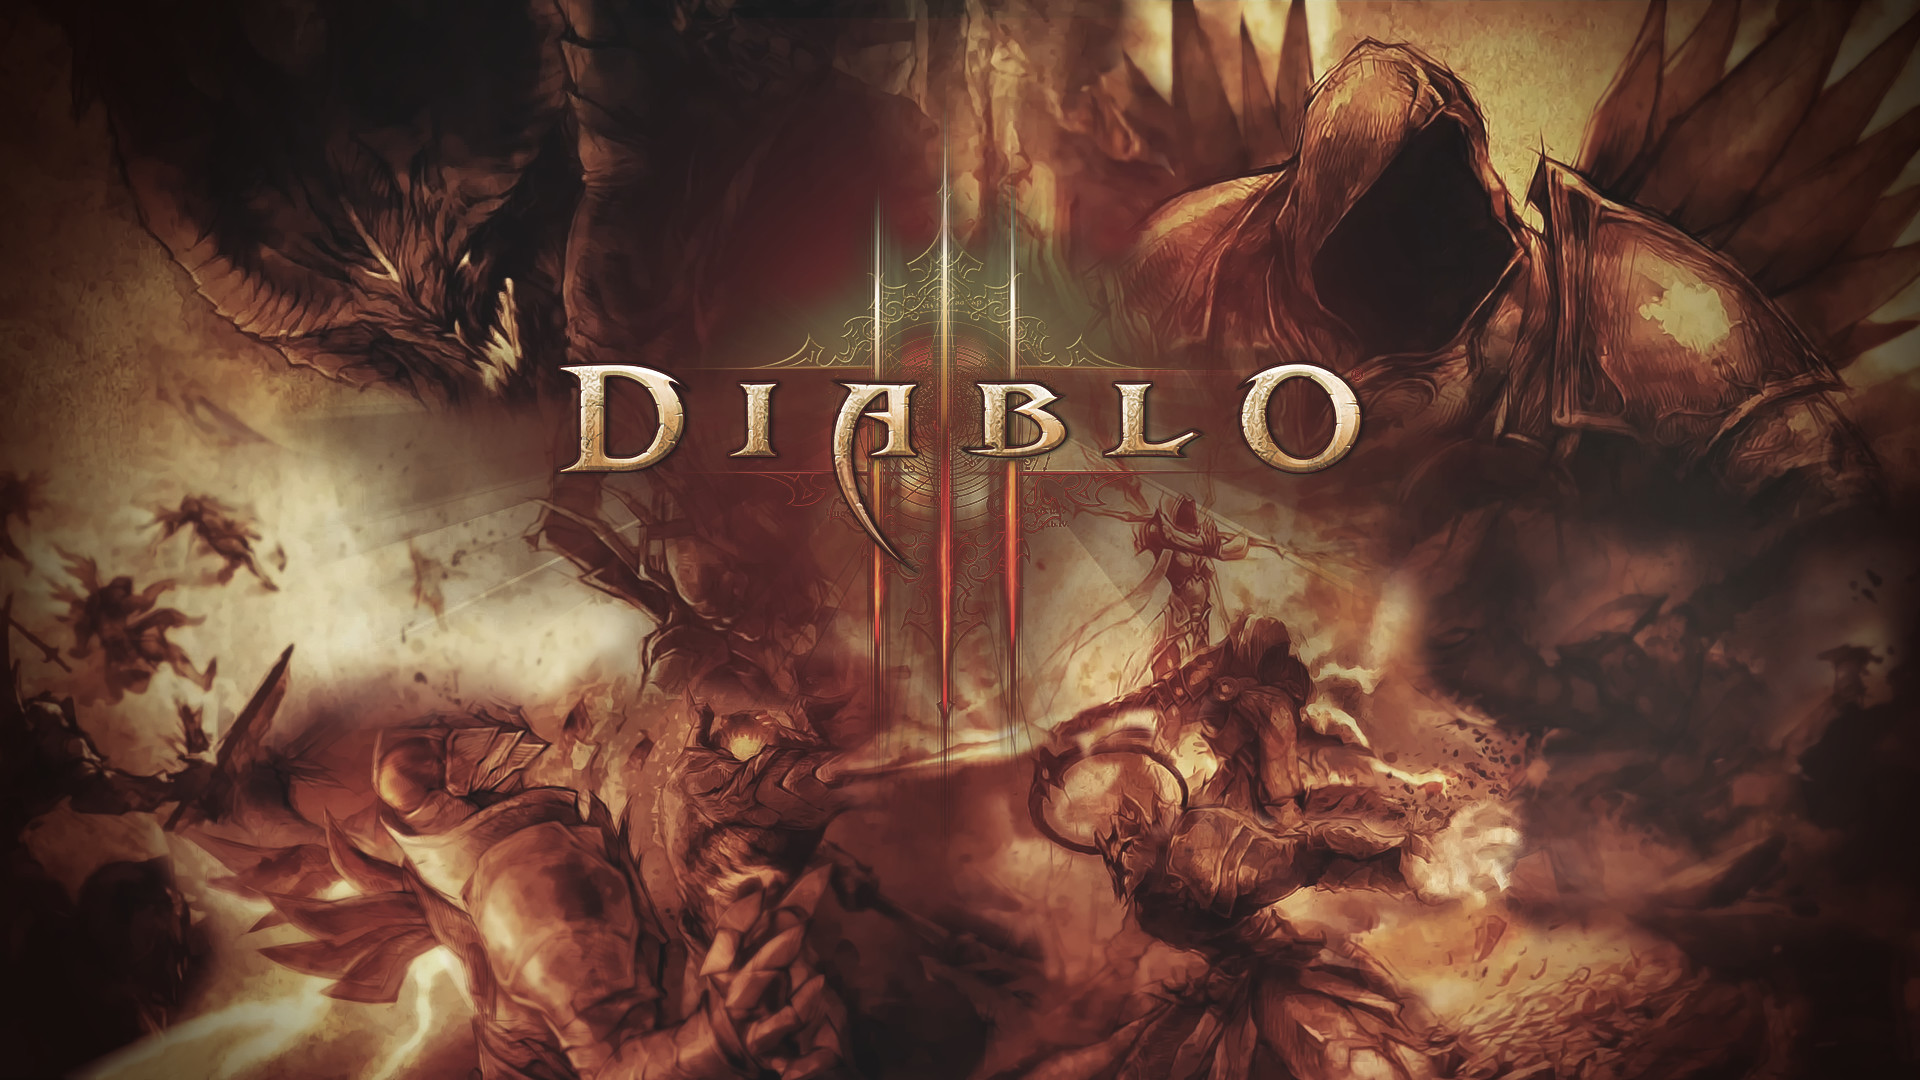 1920x1200 Fantasy Art Diablo III Barbarian Wallpaper HD